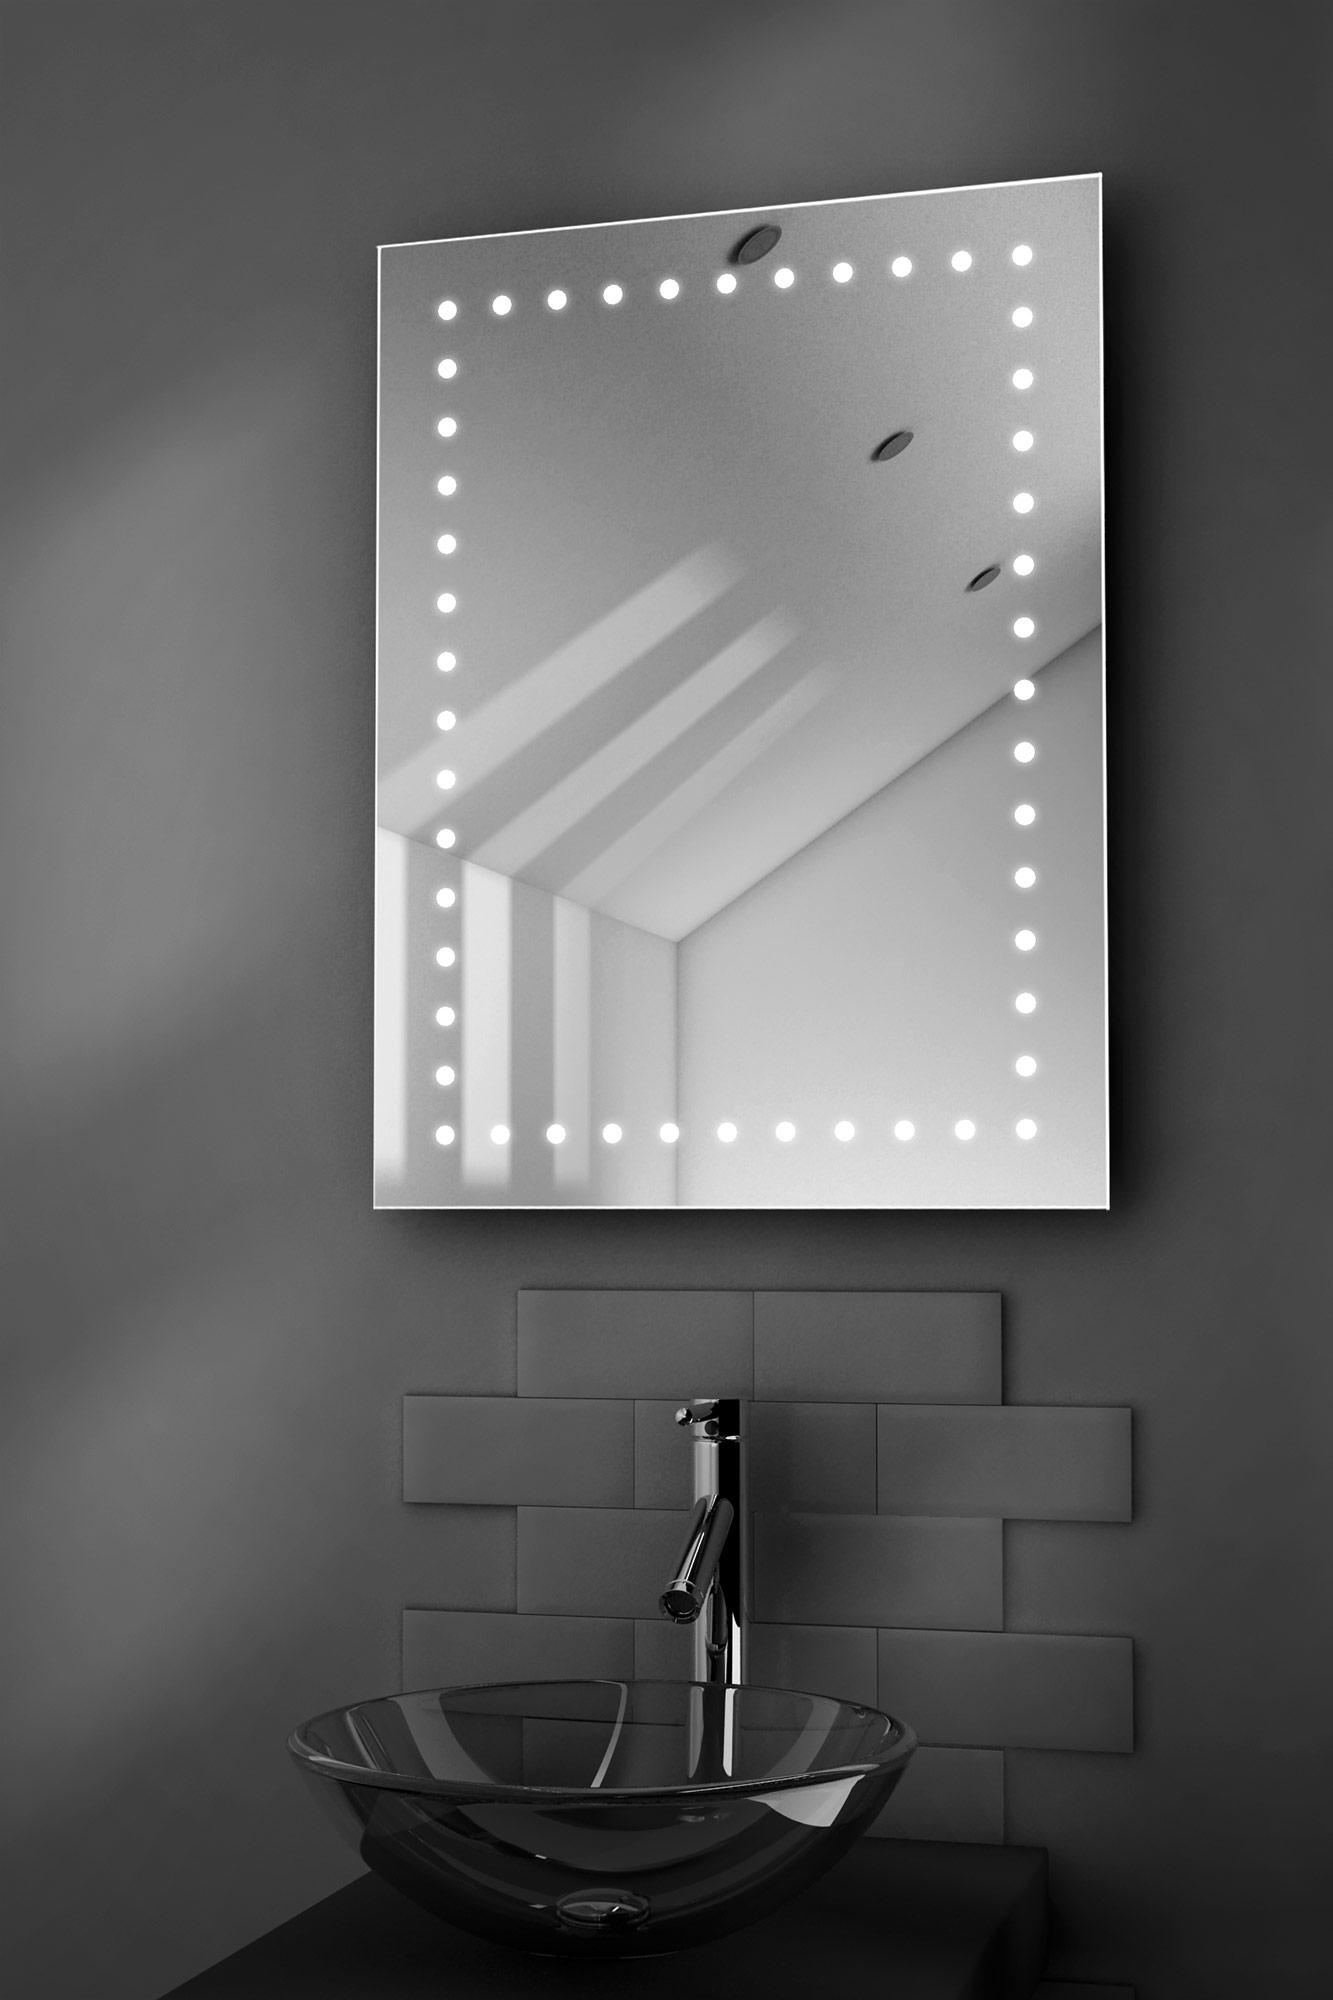 Inca ultra slim led bathroom illuminated mirror with demister pad sensor k166 ebay for Illuminated mirrors for bathrooms